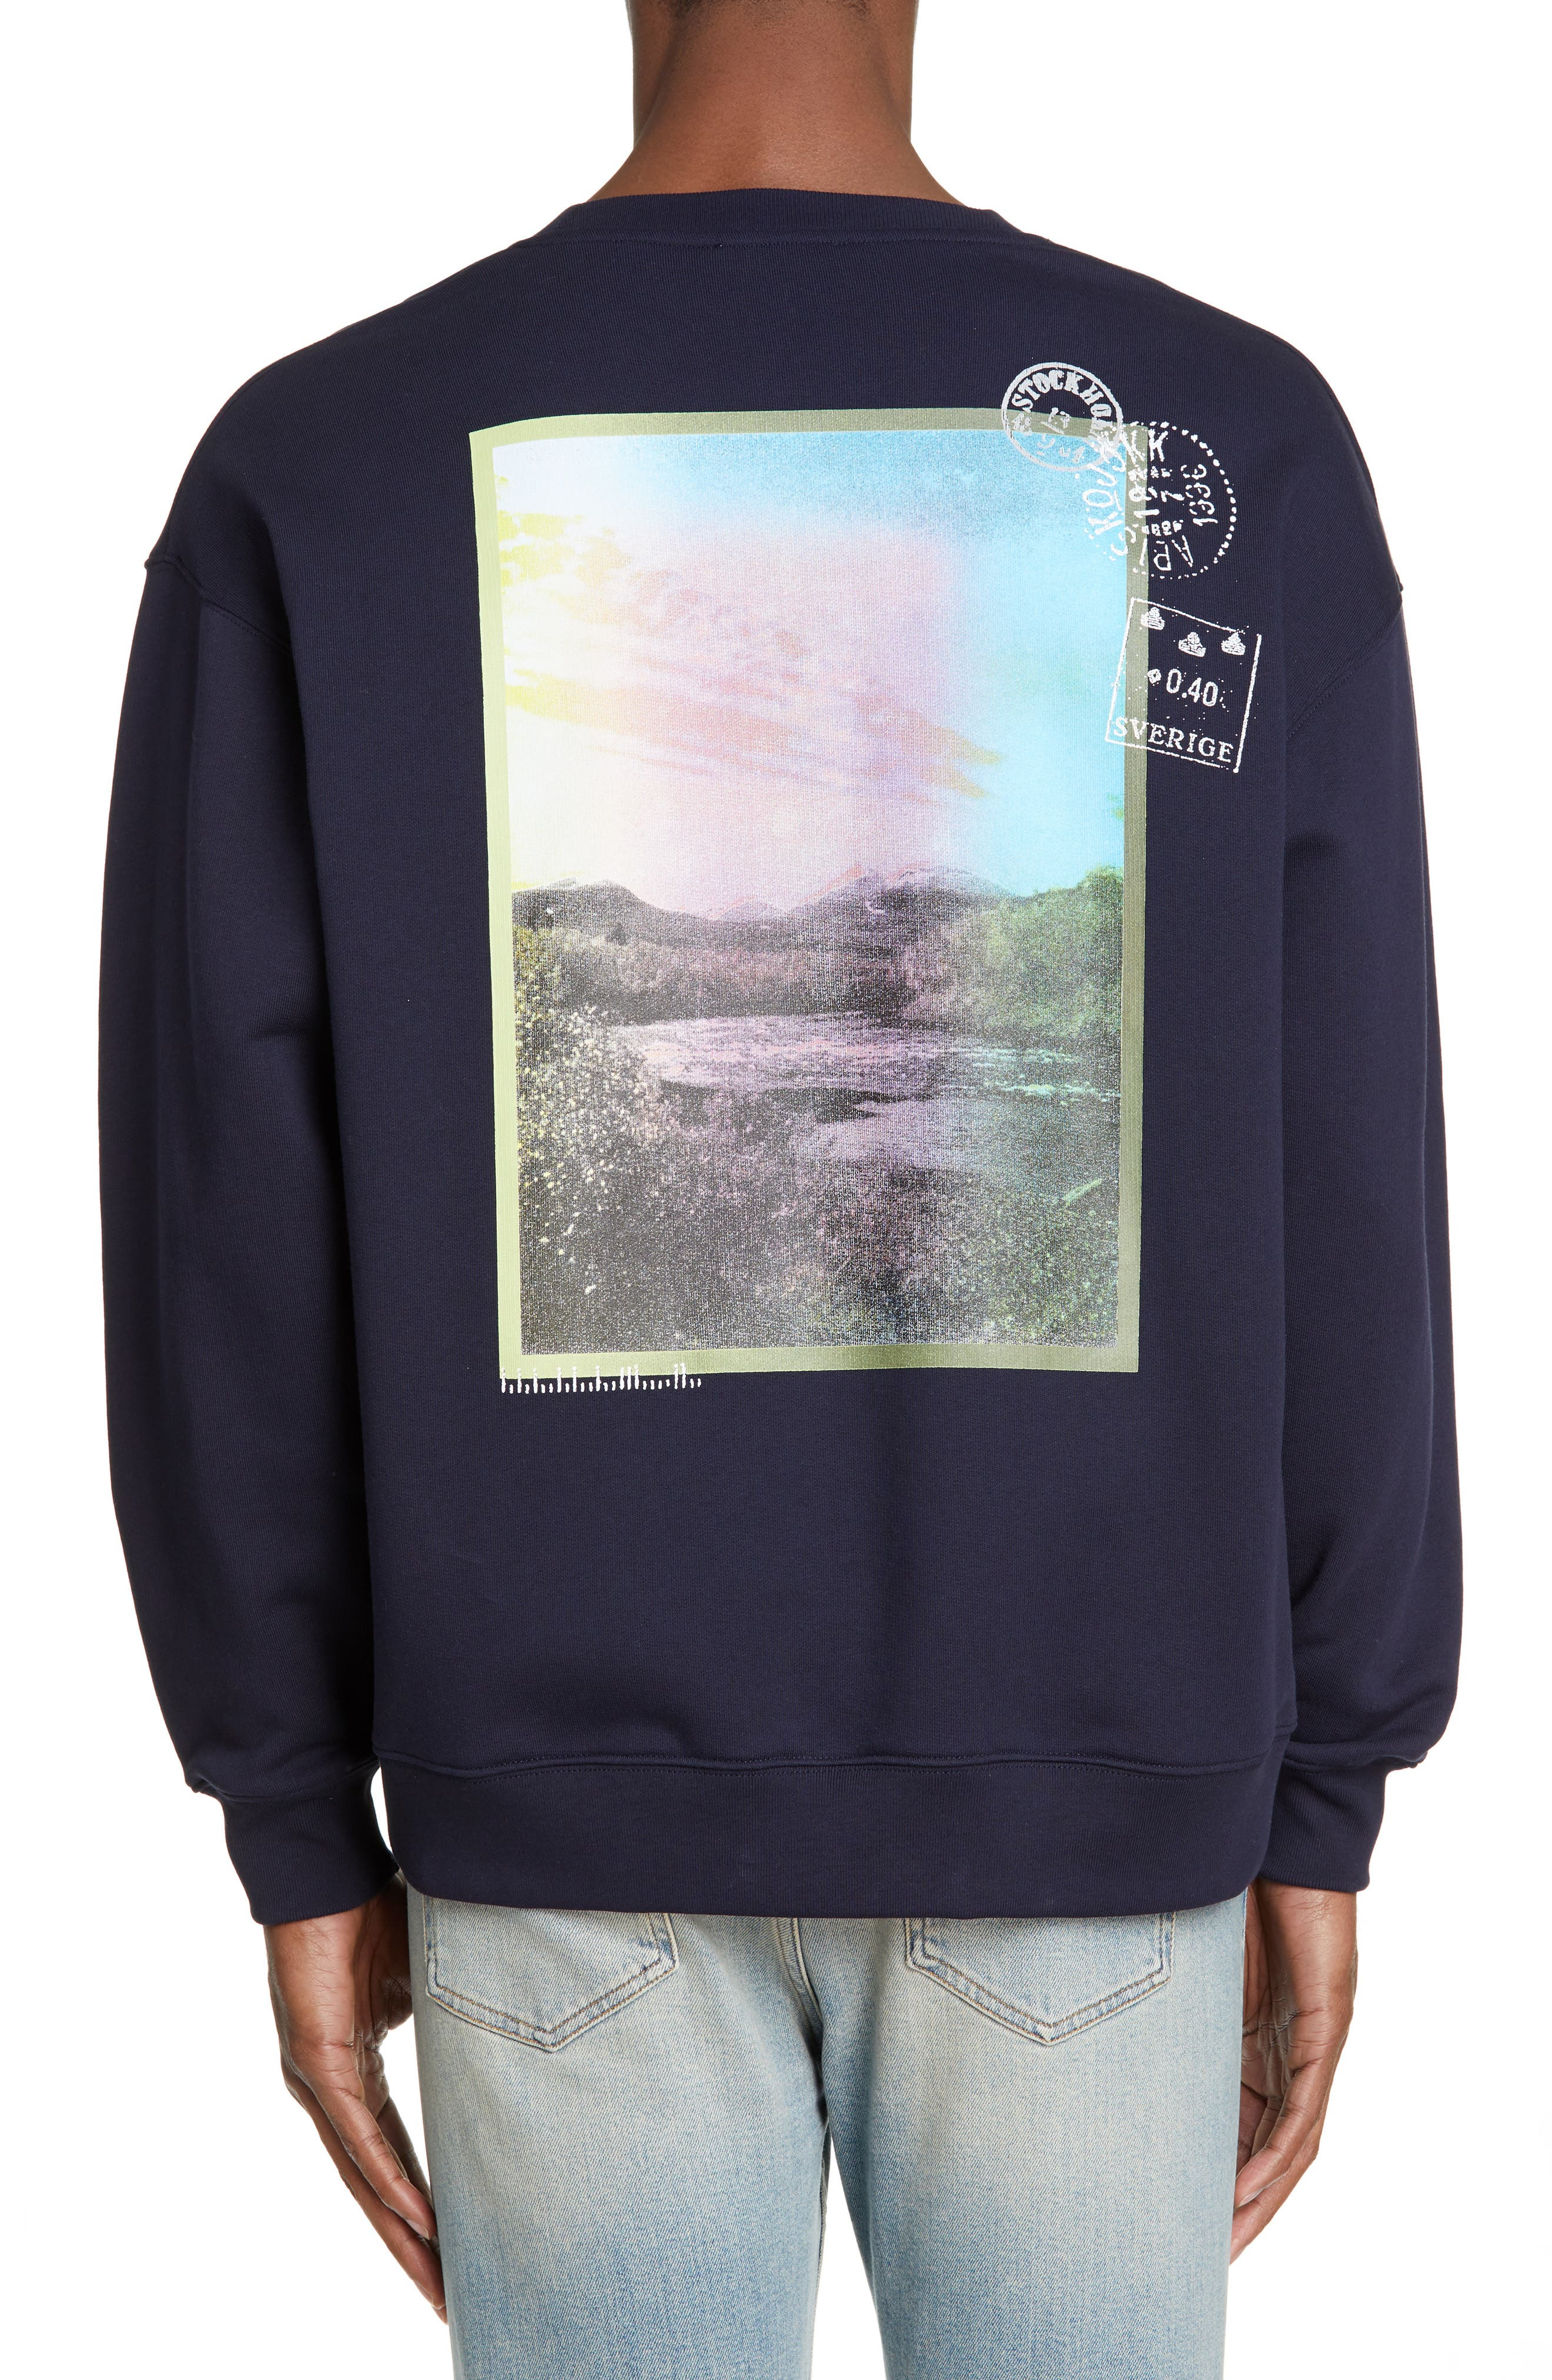 ACNE STUDIOS, Forba Sweden Graphic Sweatshirt, Alternate thumbnail 2, color, NAVY